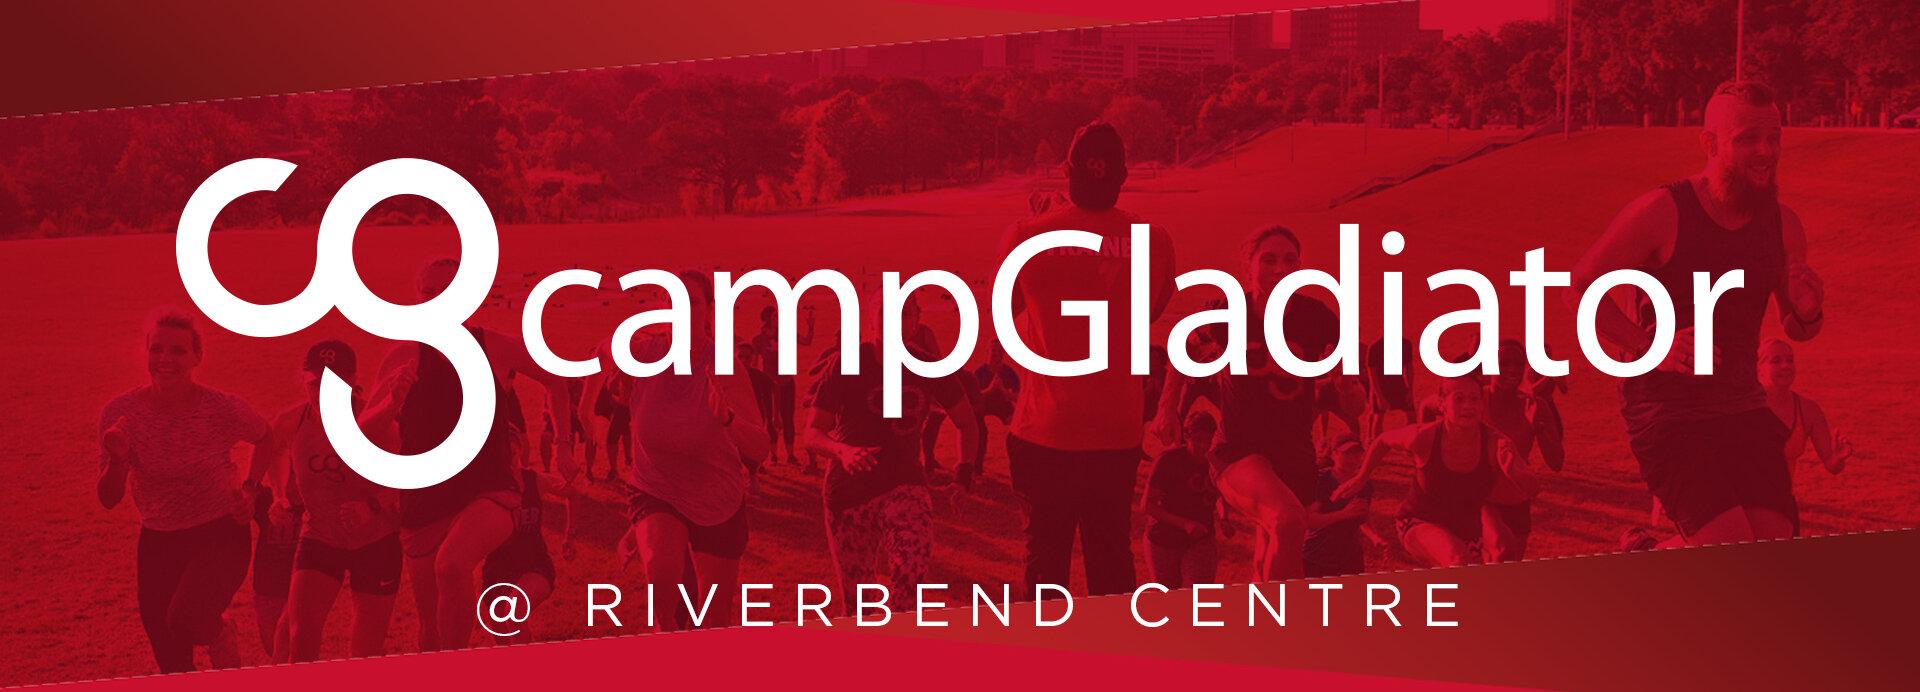 Camp-Gladiator_1920x692.jpg